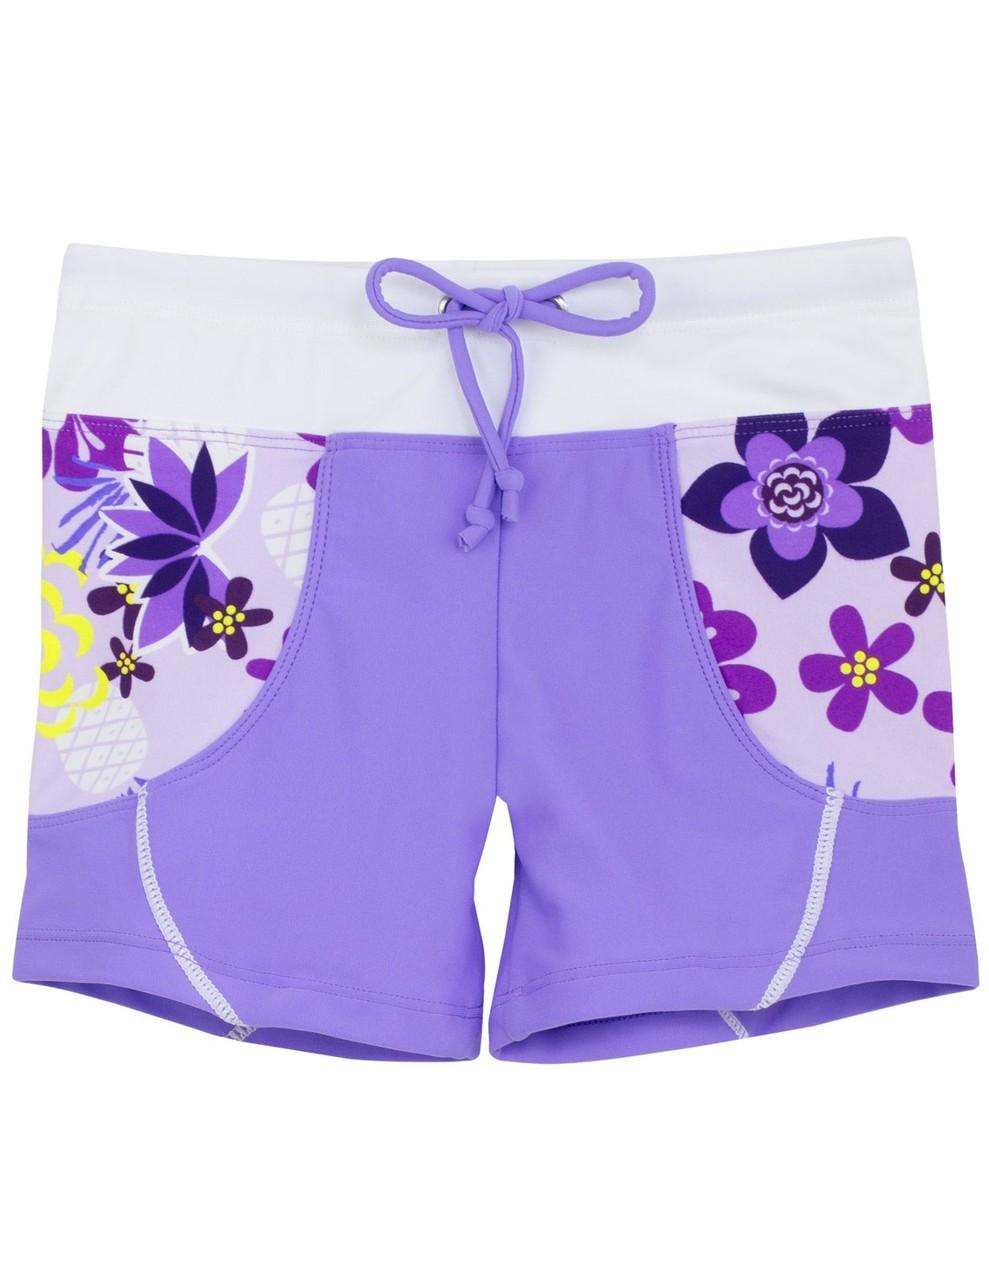 a3b9b410d6 Tuga Girls UV Short Swim Shorts Agate | Girls UV Clothing